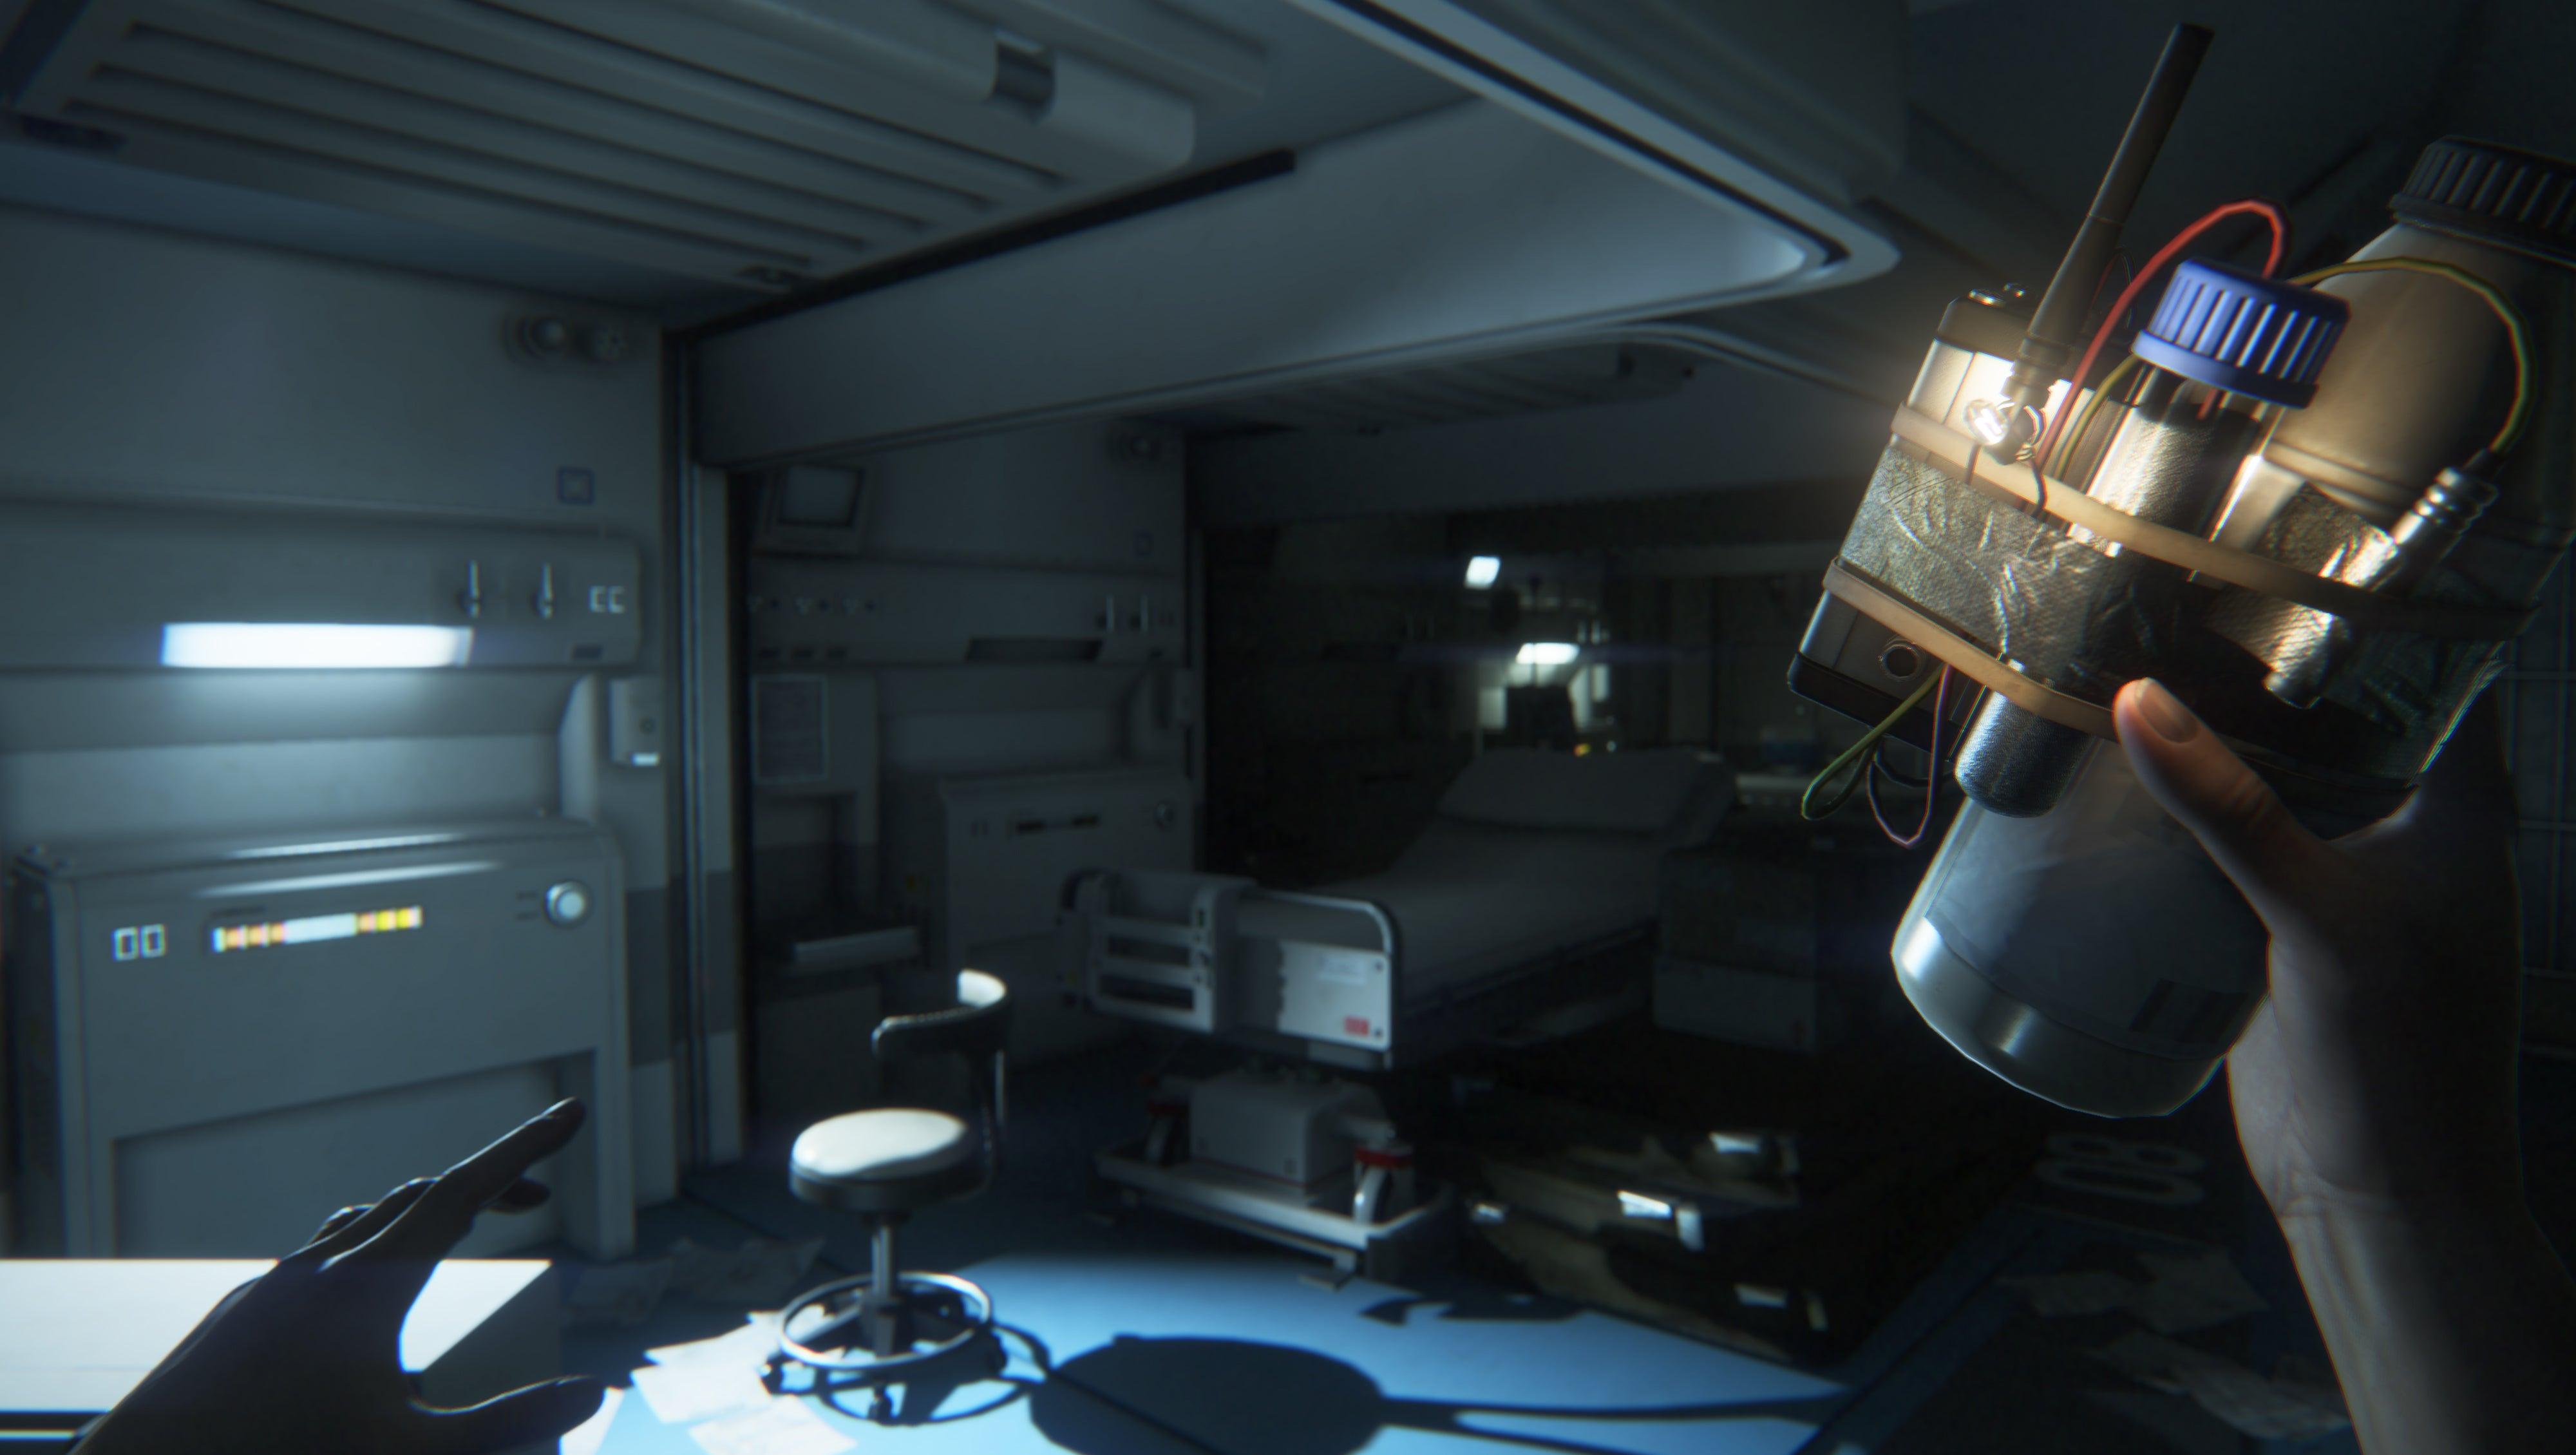 How The Alien In Alien: Isolation Works